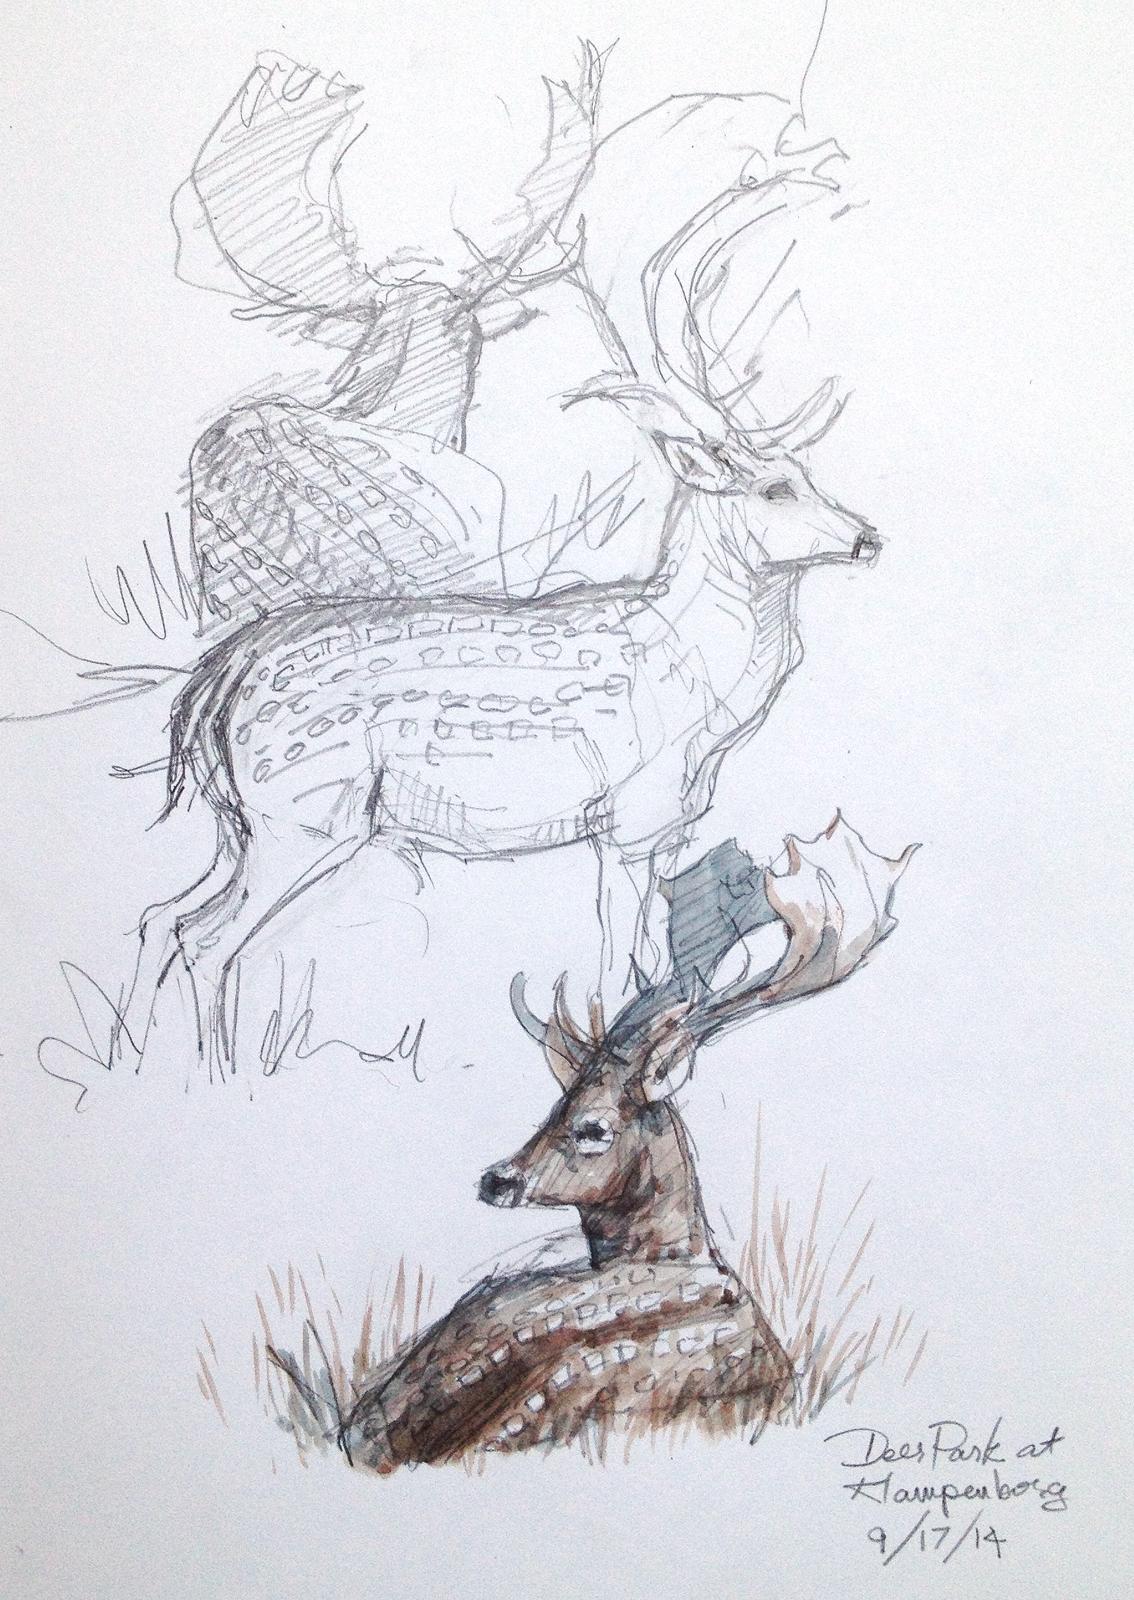 denmark sketchbook 2014  u2013 drawing the motmot